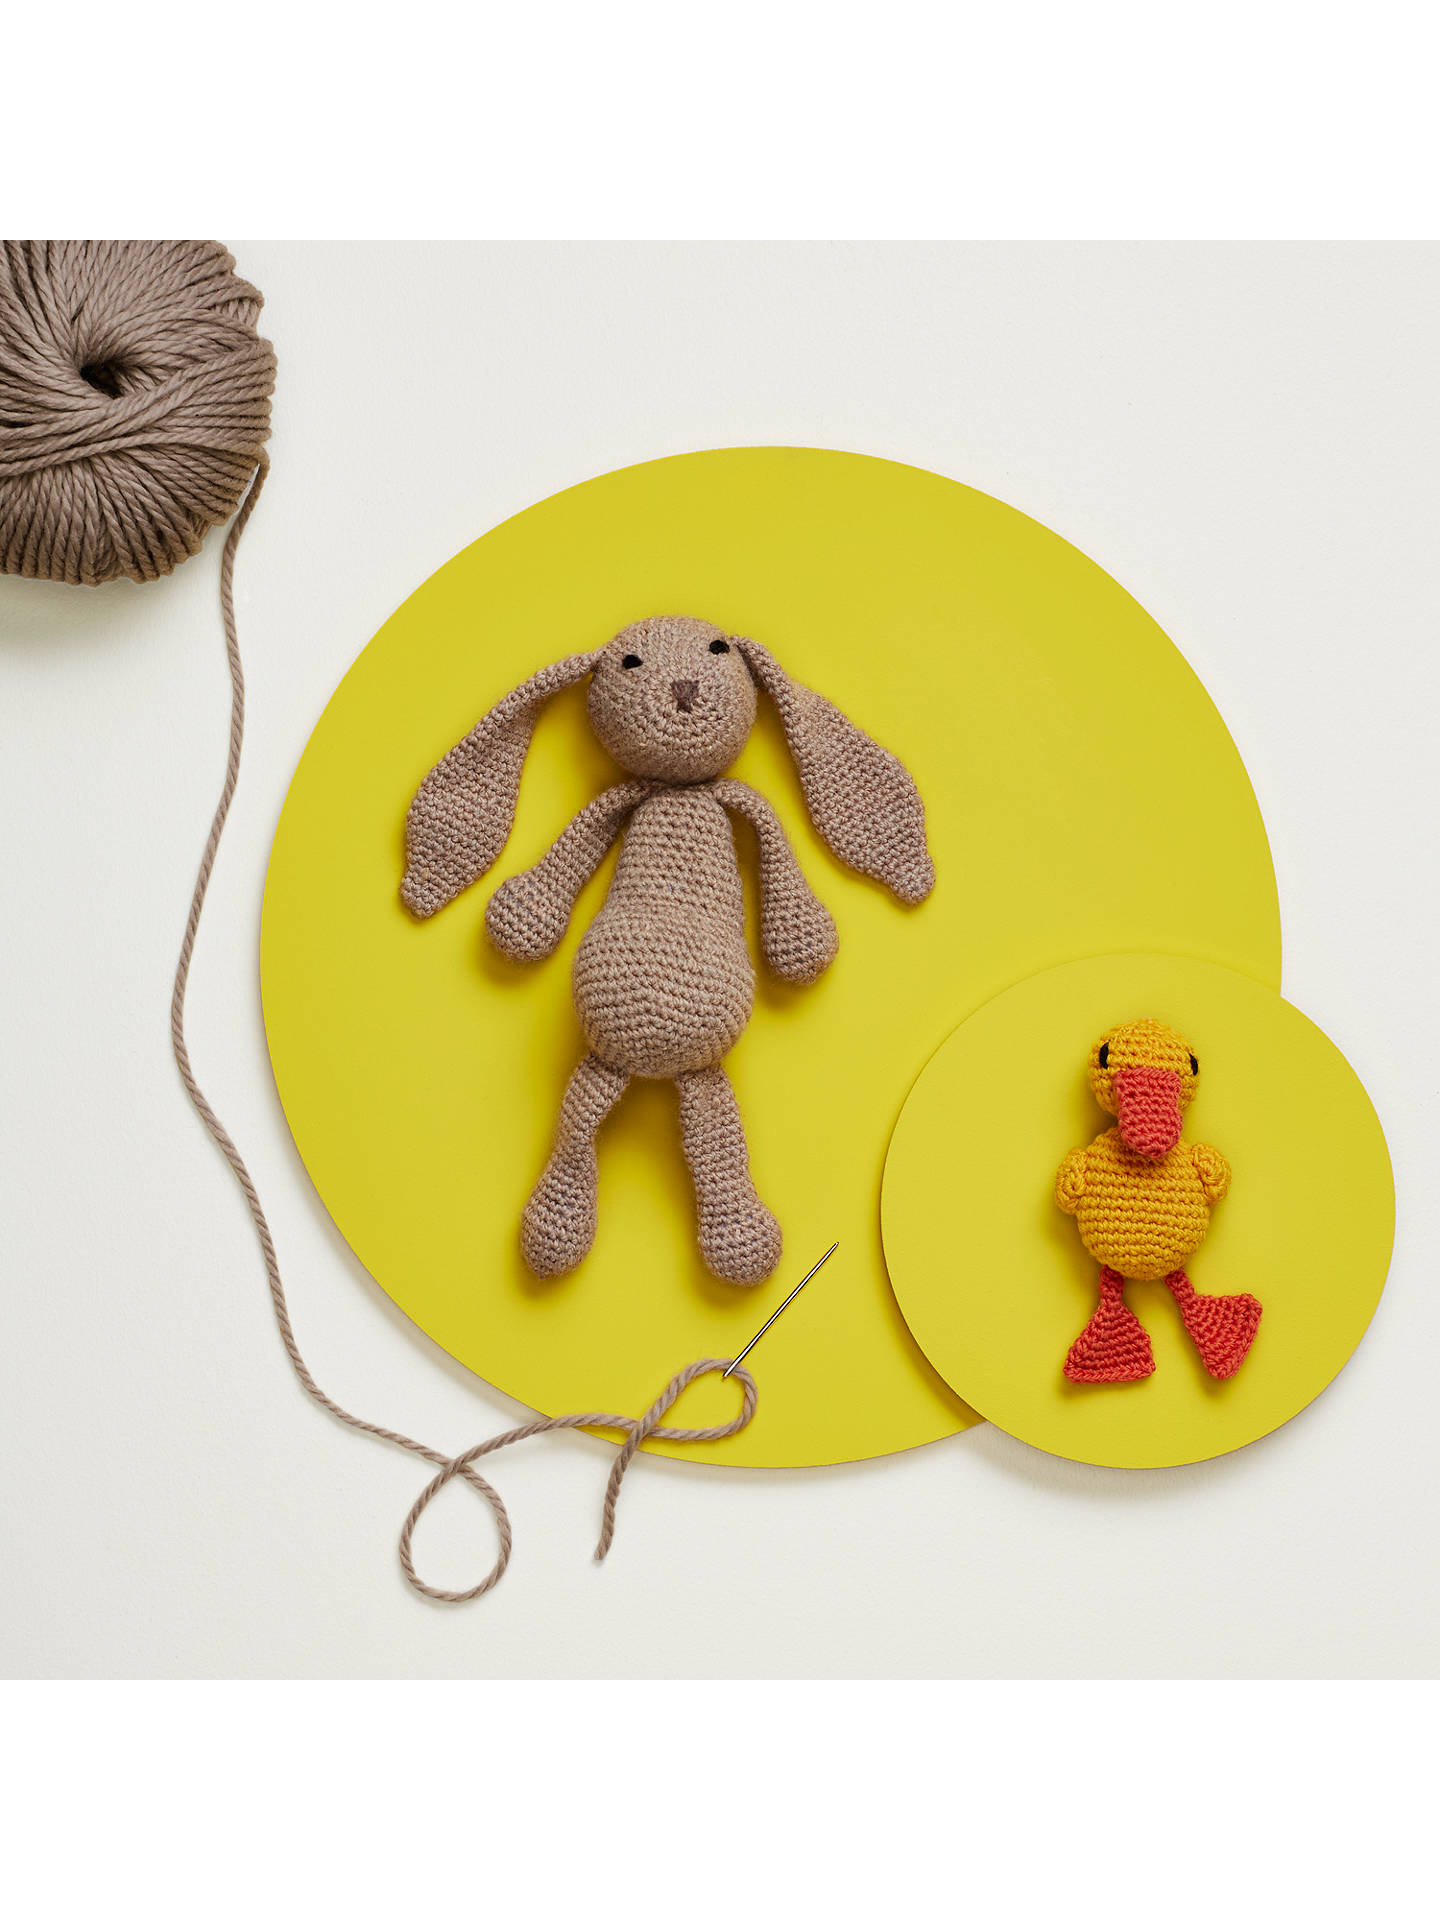 Toft Emma The Bunny Crochet Kit At John Lewis Partners